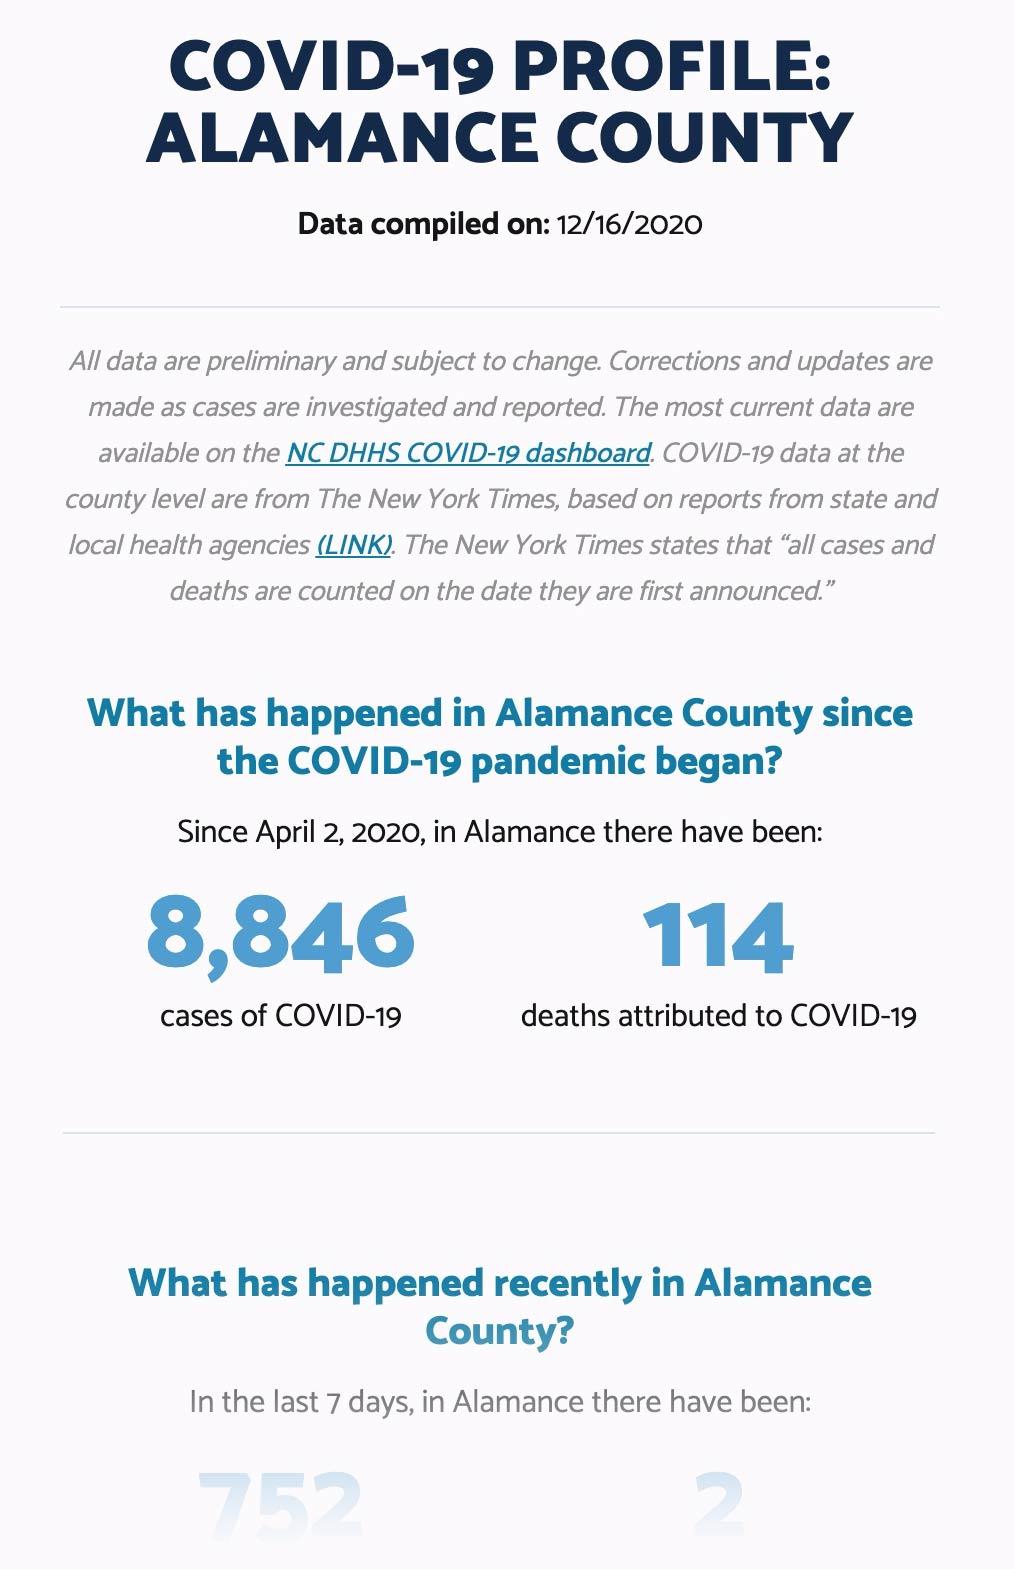 Alamance county profile example